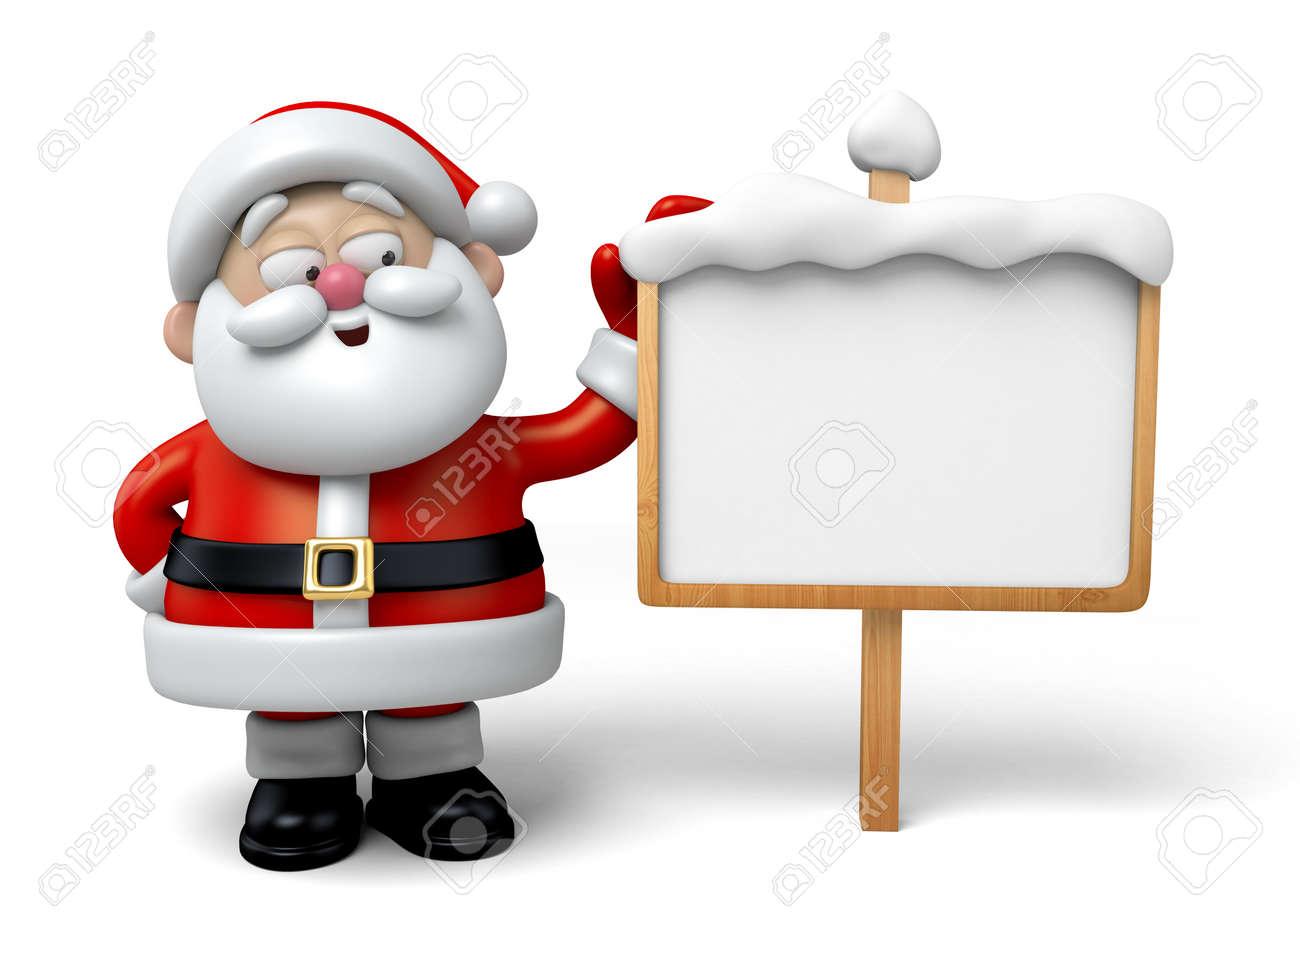 The Santa Claus and a billboard - 47549419